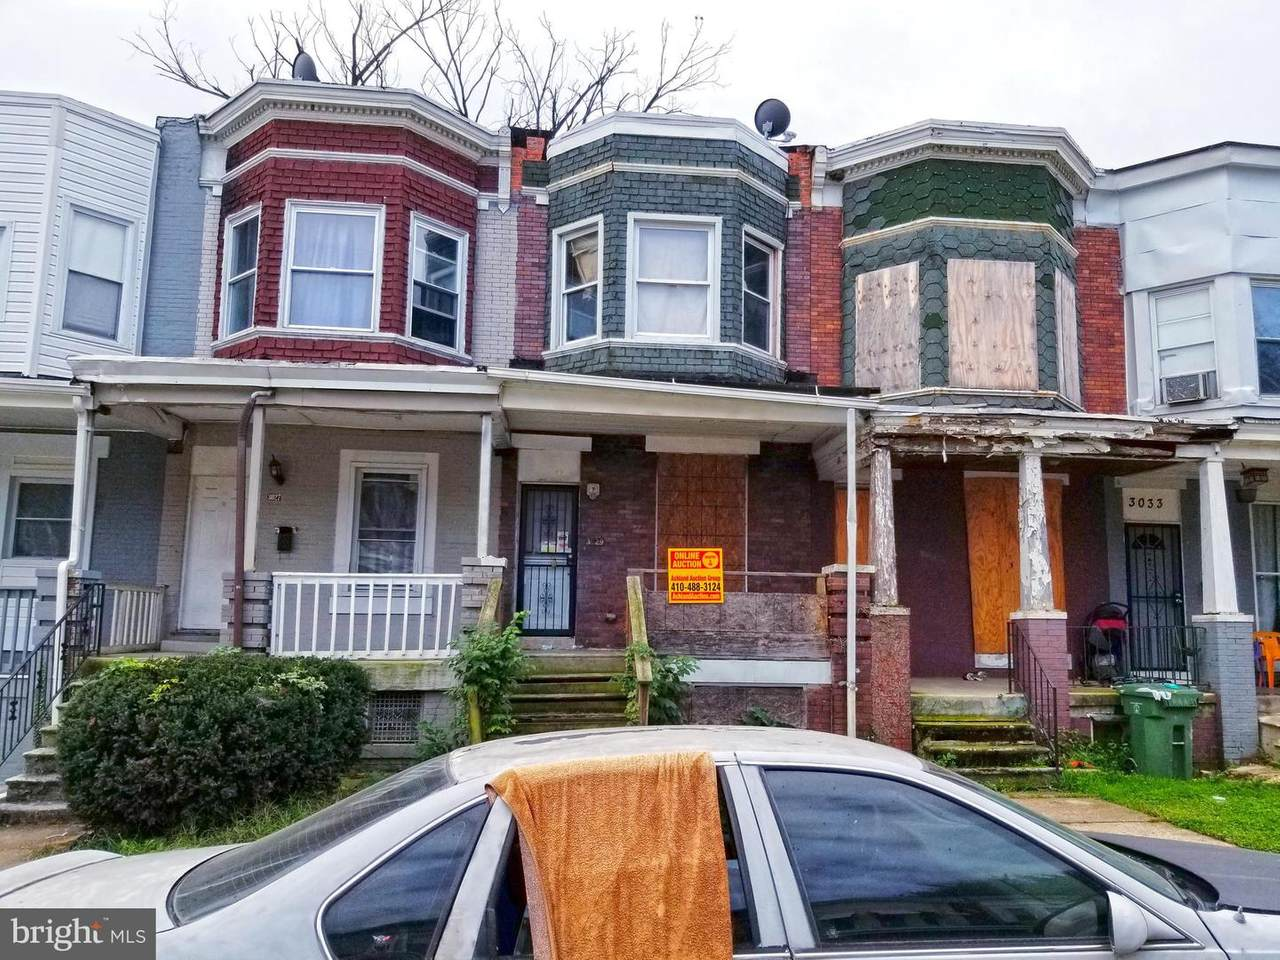 3029 Grayson Street - Photo 1